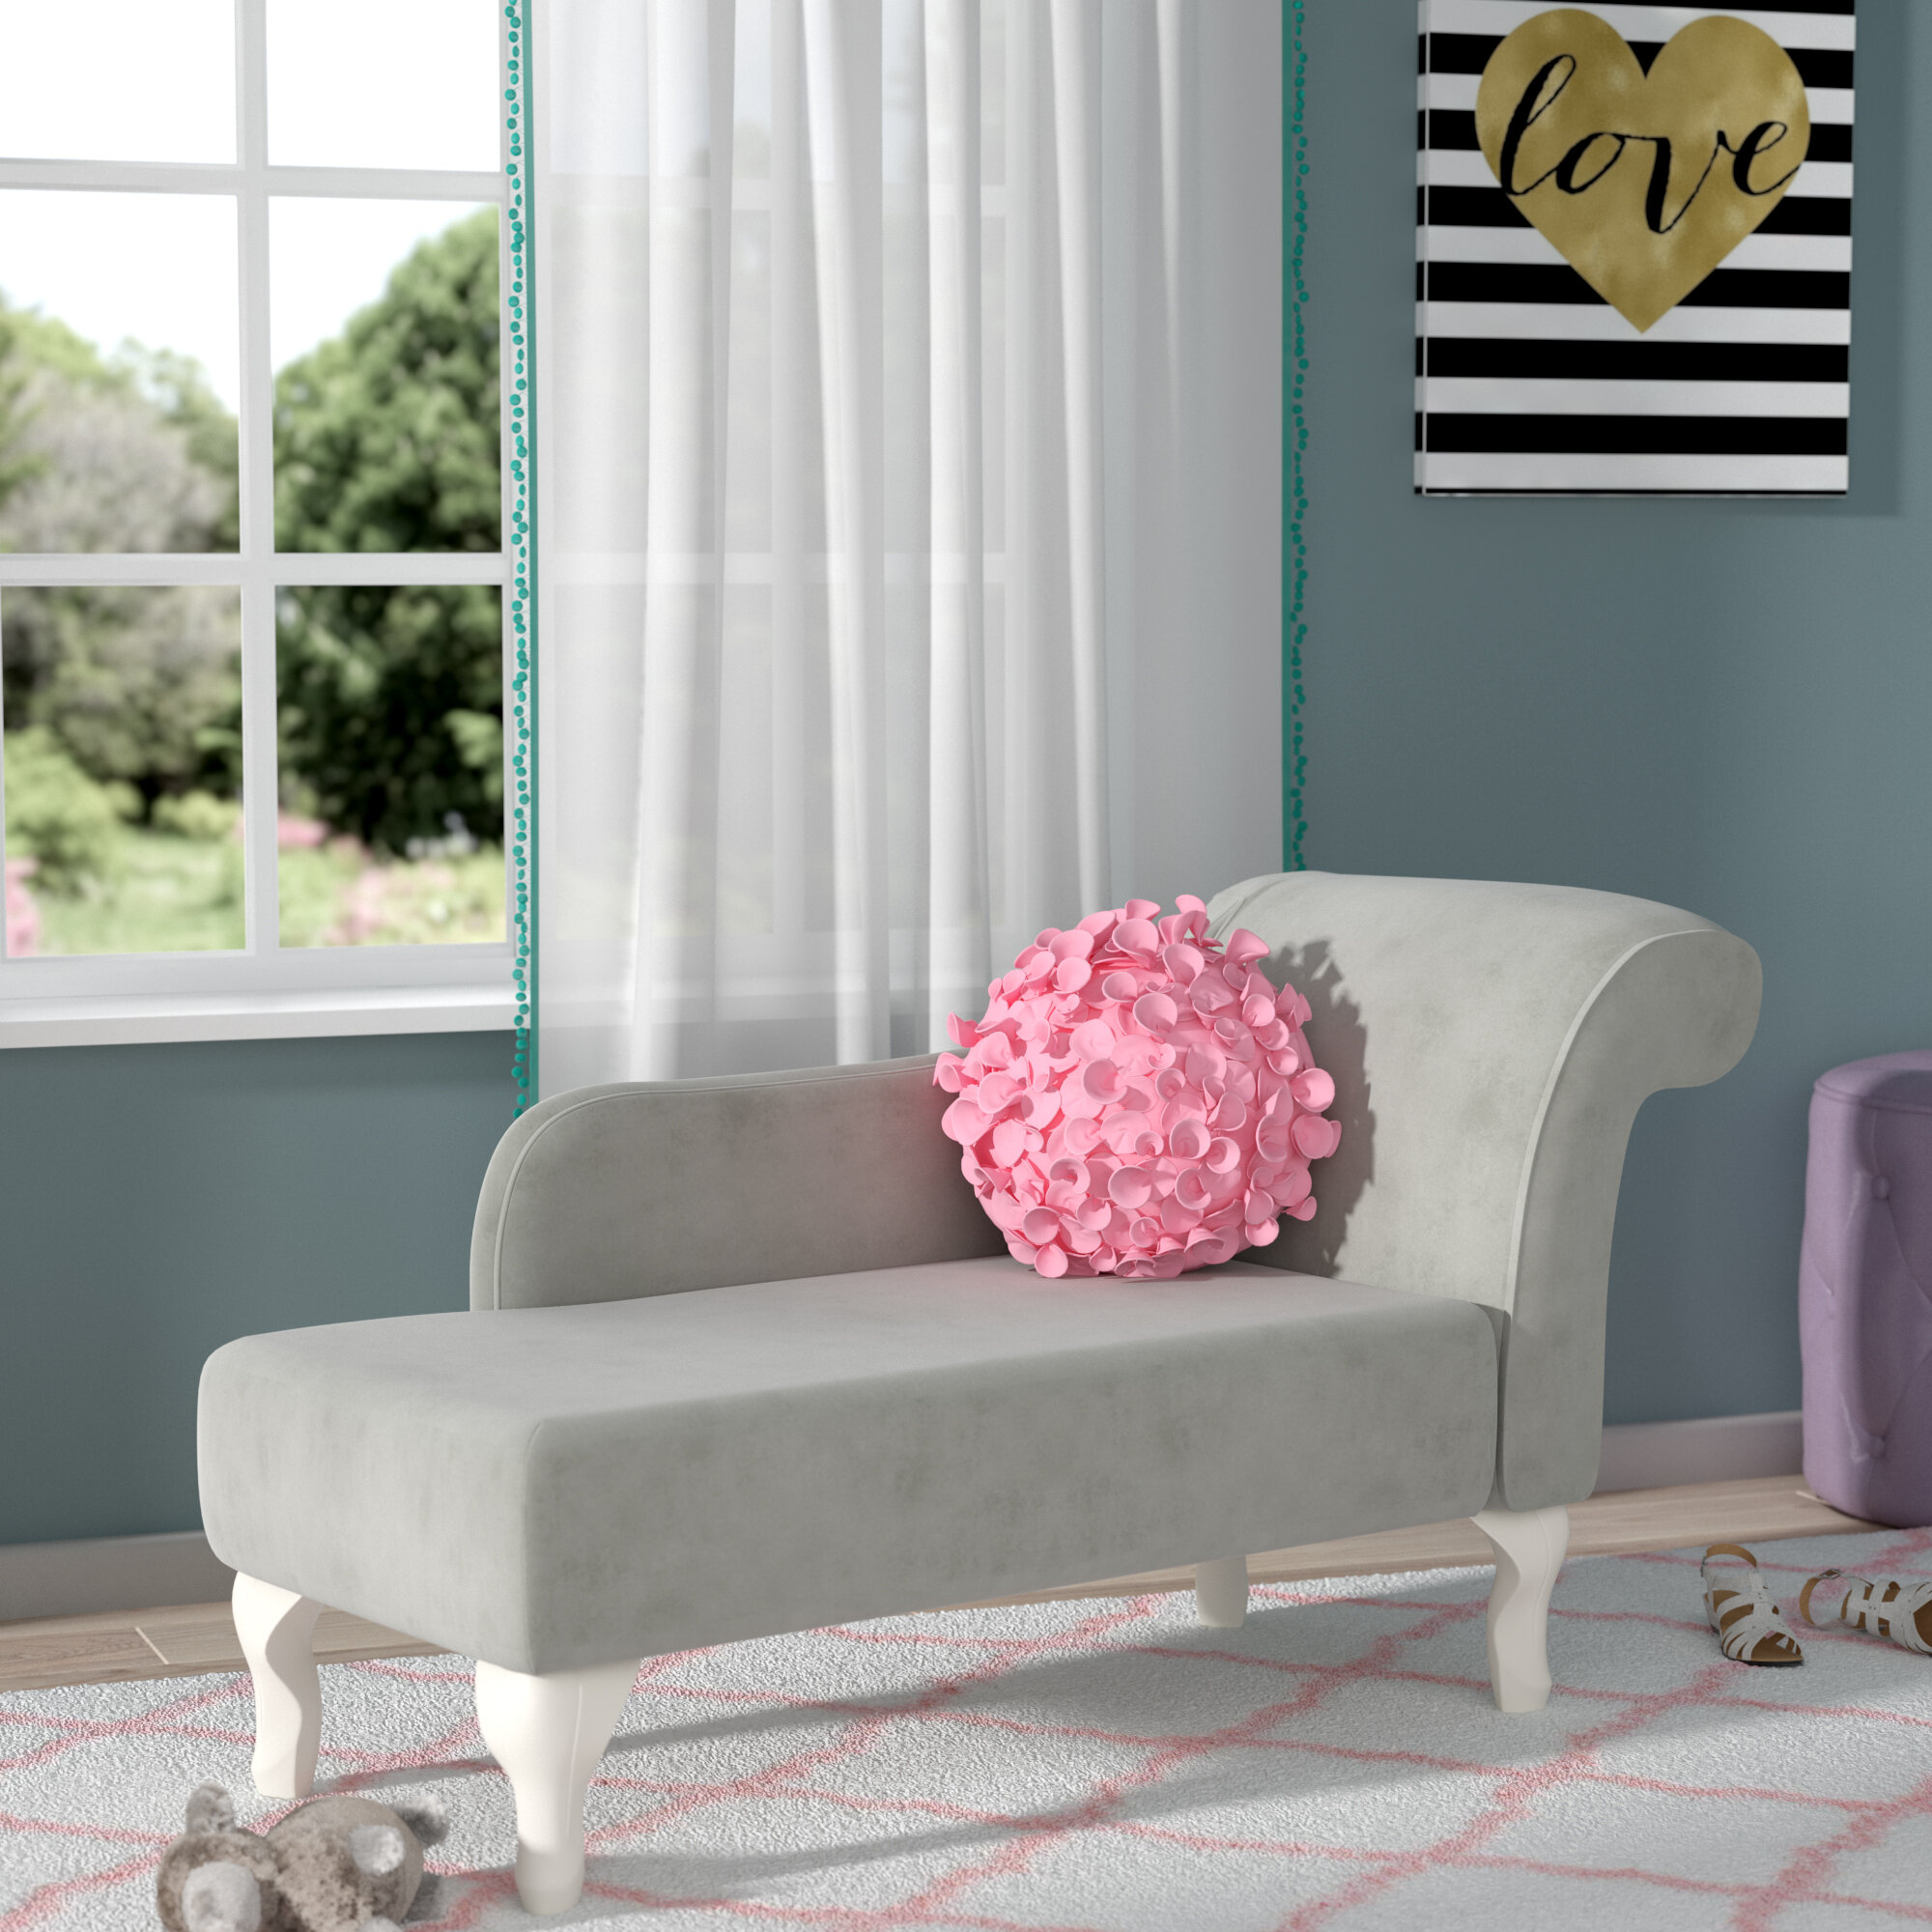 toys kidkraft ca girls pink amazon dp games girl chaise princess dropship lounge s